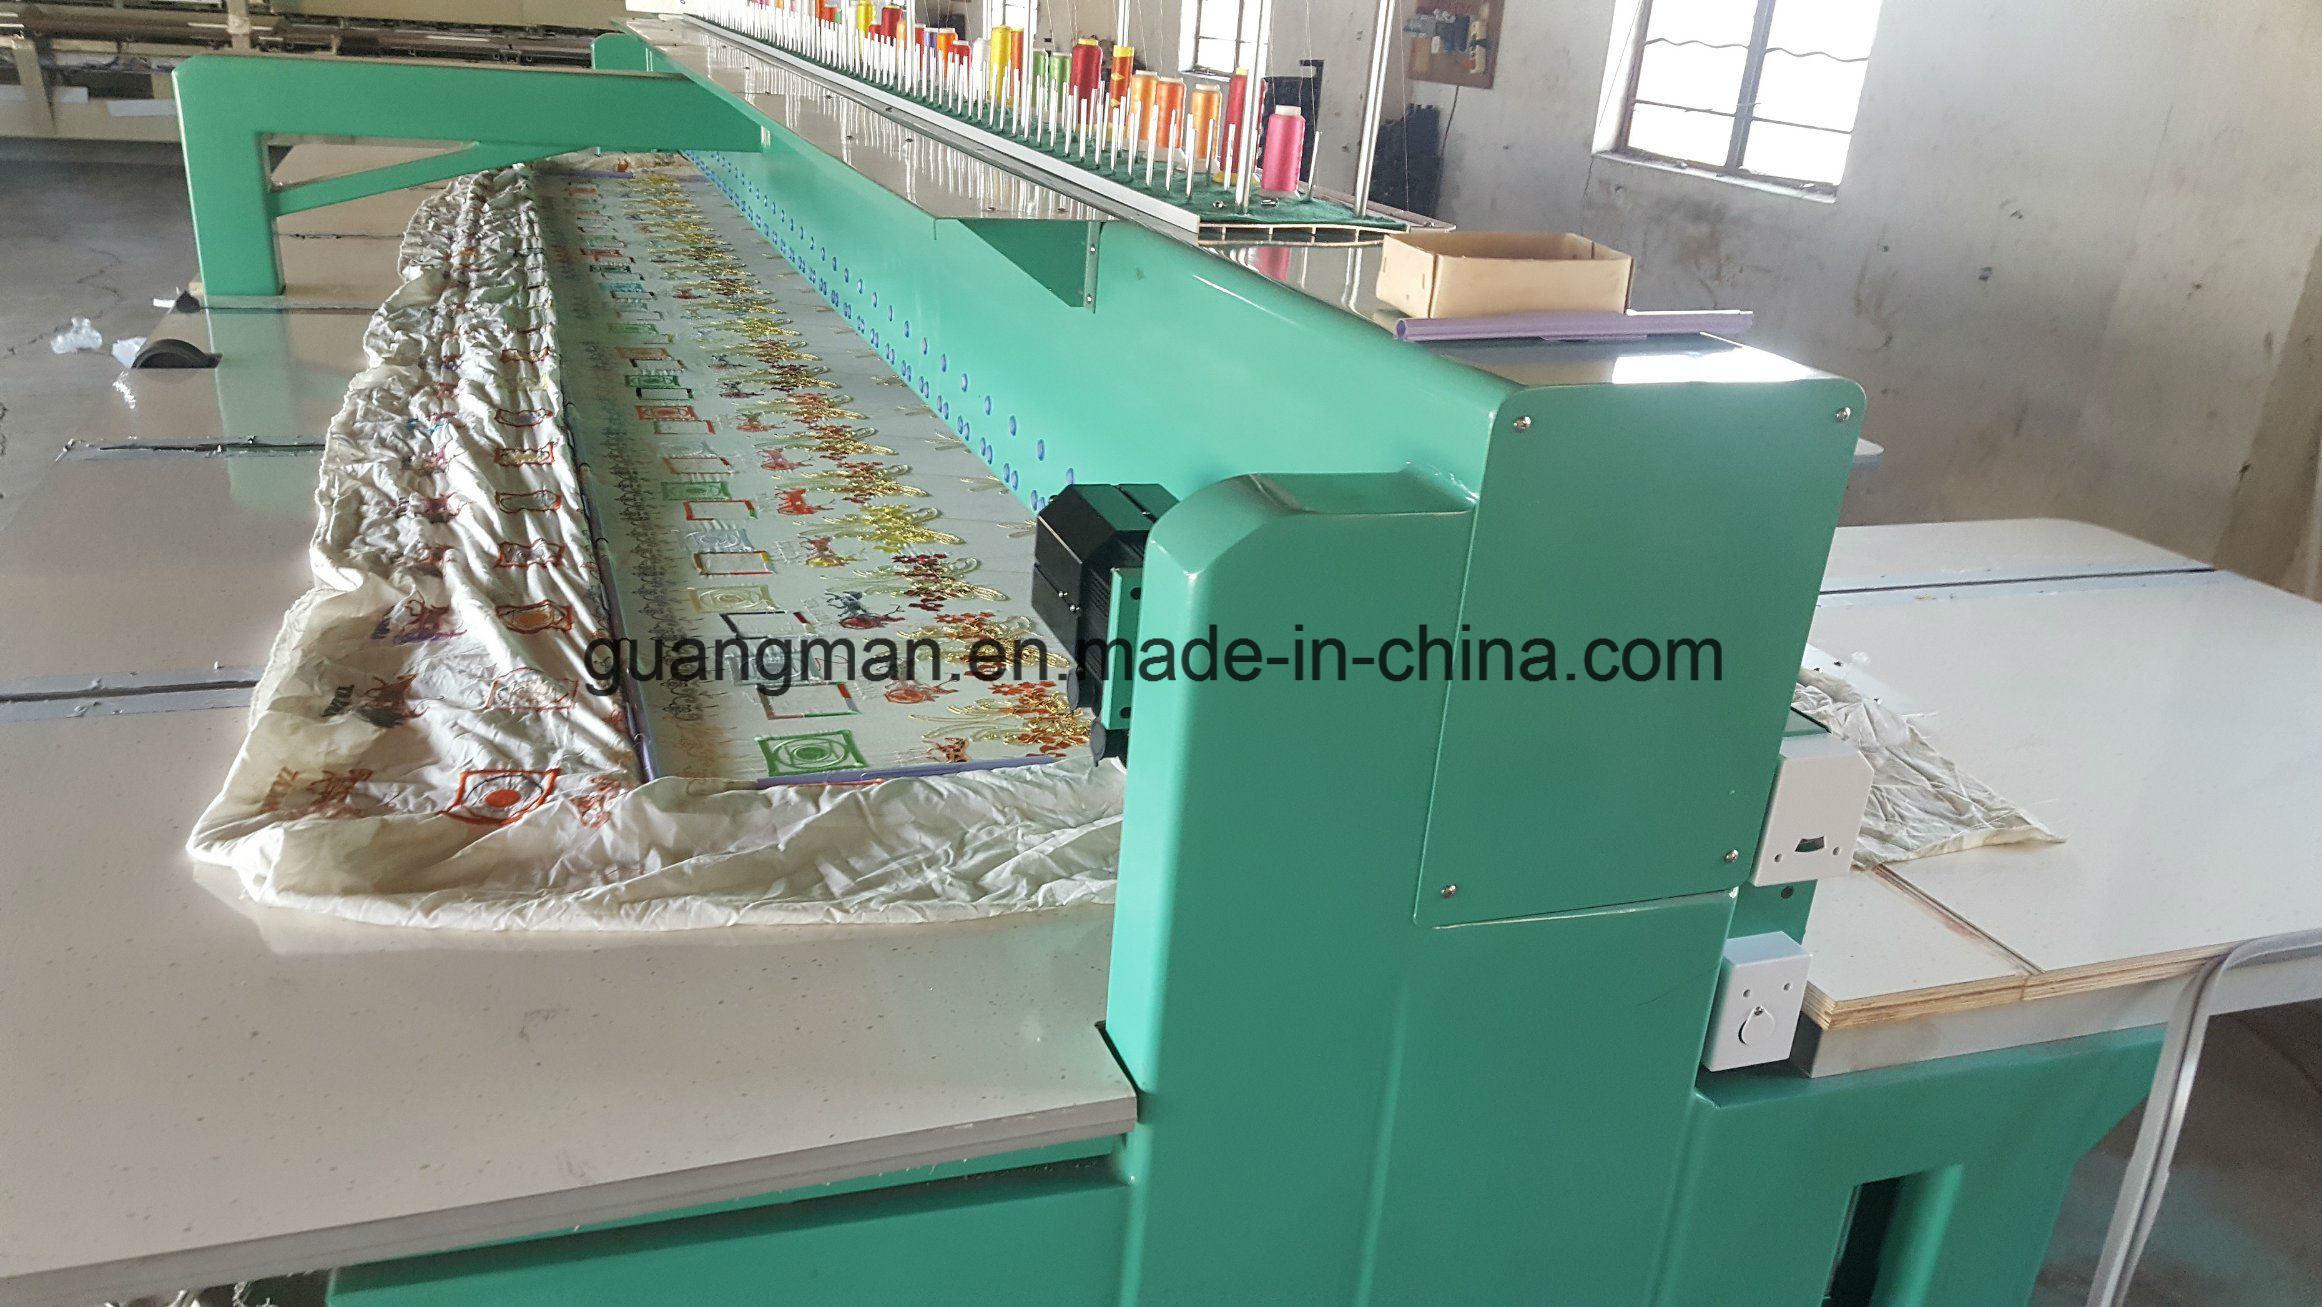 Hye-FL 636/125*550*1300 Flat Embroidery Machine